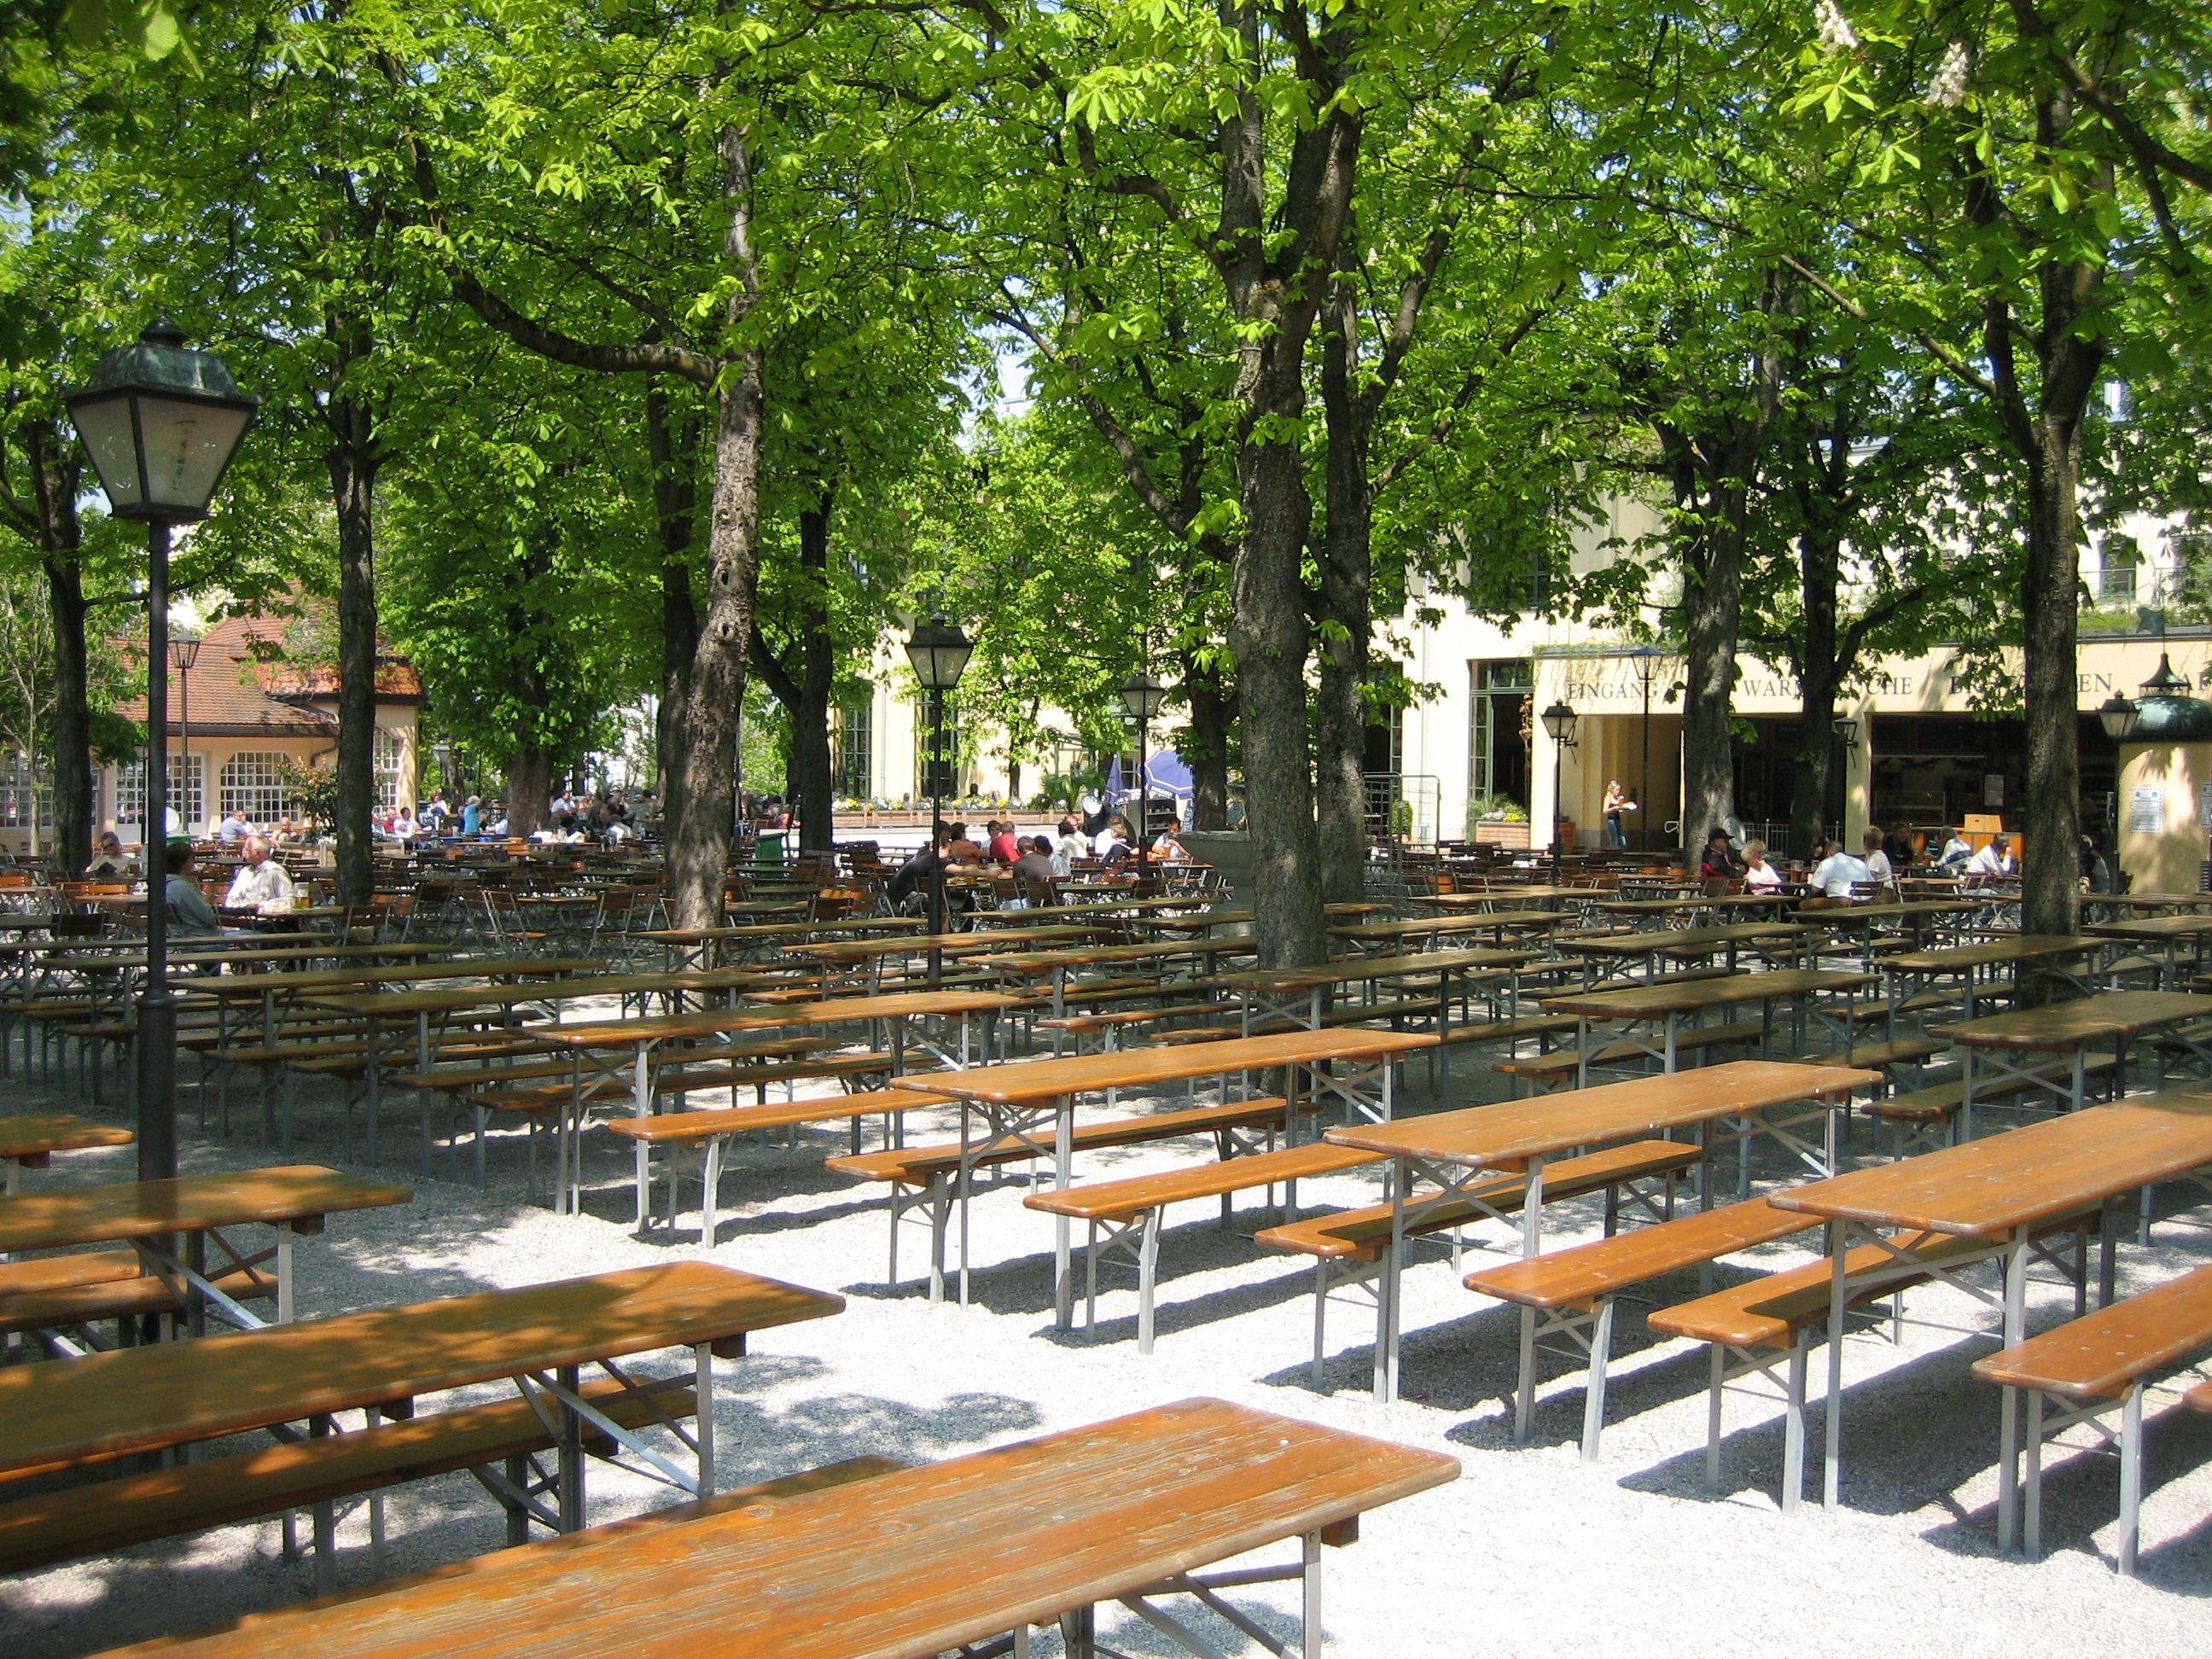 File:Nockherberg München Paulaner Biergarten.jpg - Wikimedia Commons